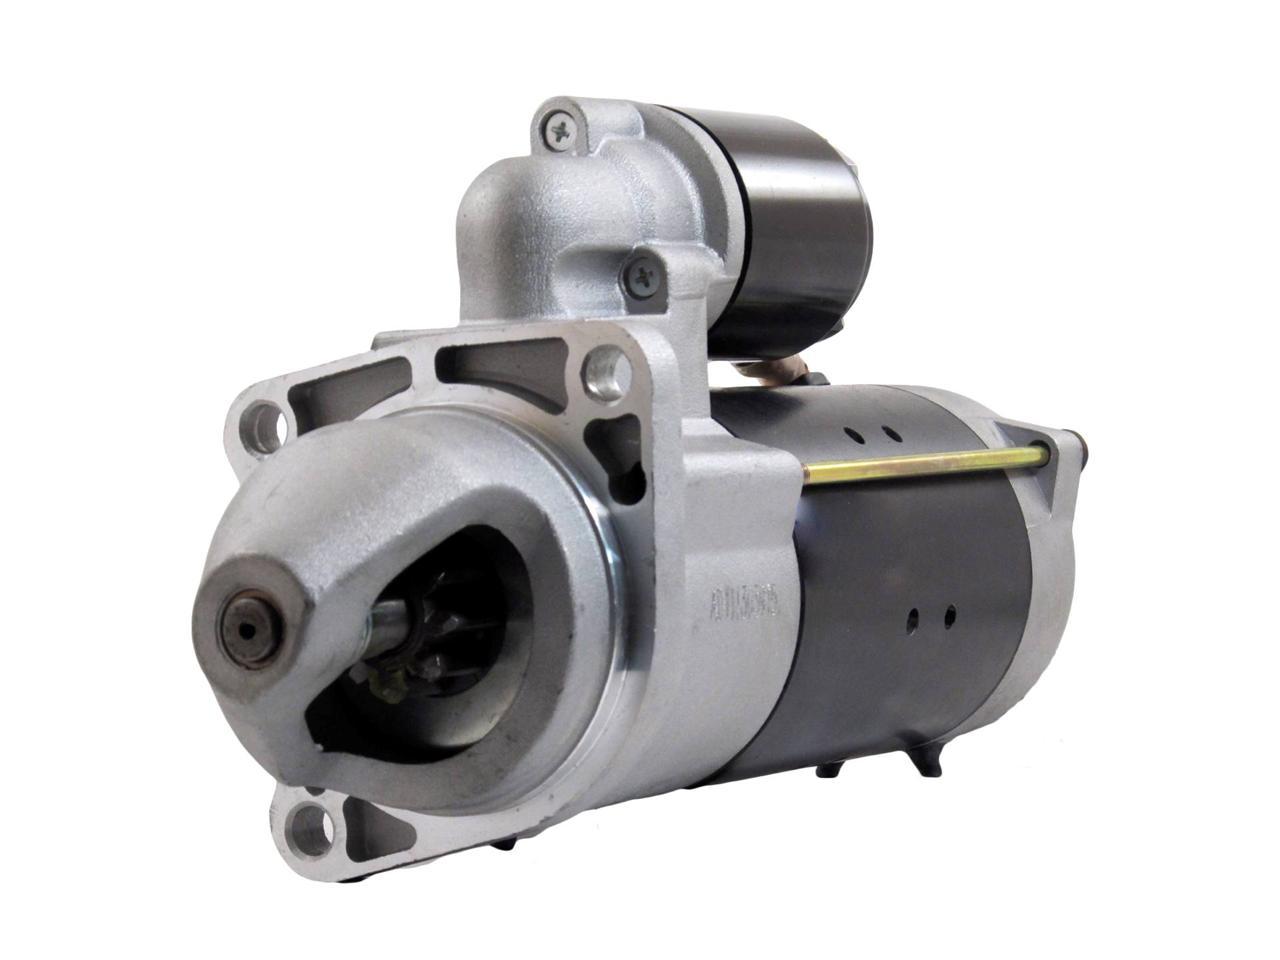 hight resolution of new starter fits ingersoll rand 7020413 118 0928 063209501 01180928kz iso841